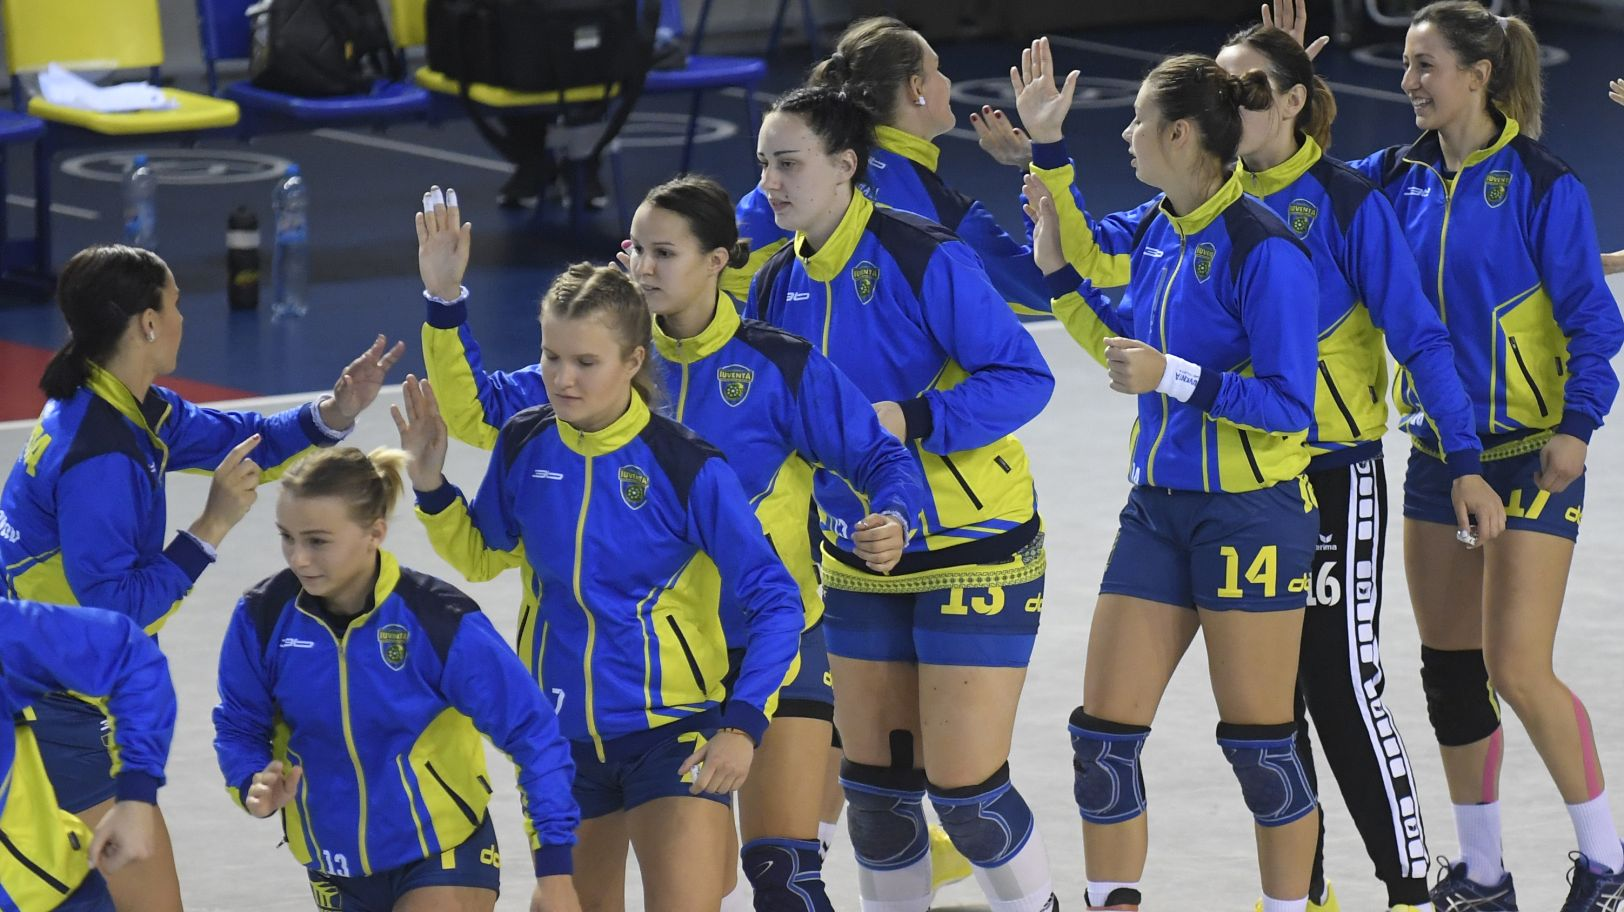 MOL liga žien: Prvá pätica víťazne, doma neuspel len Olomouc